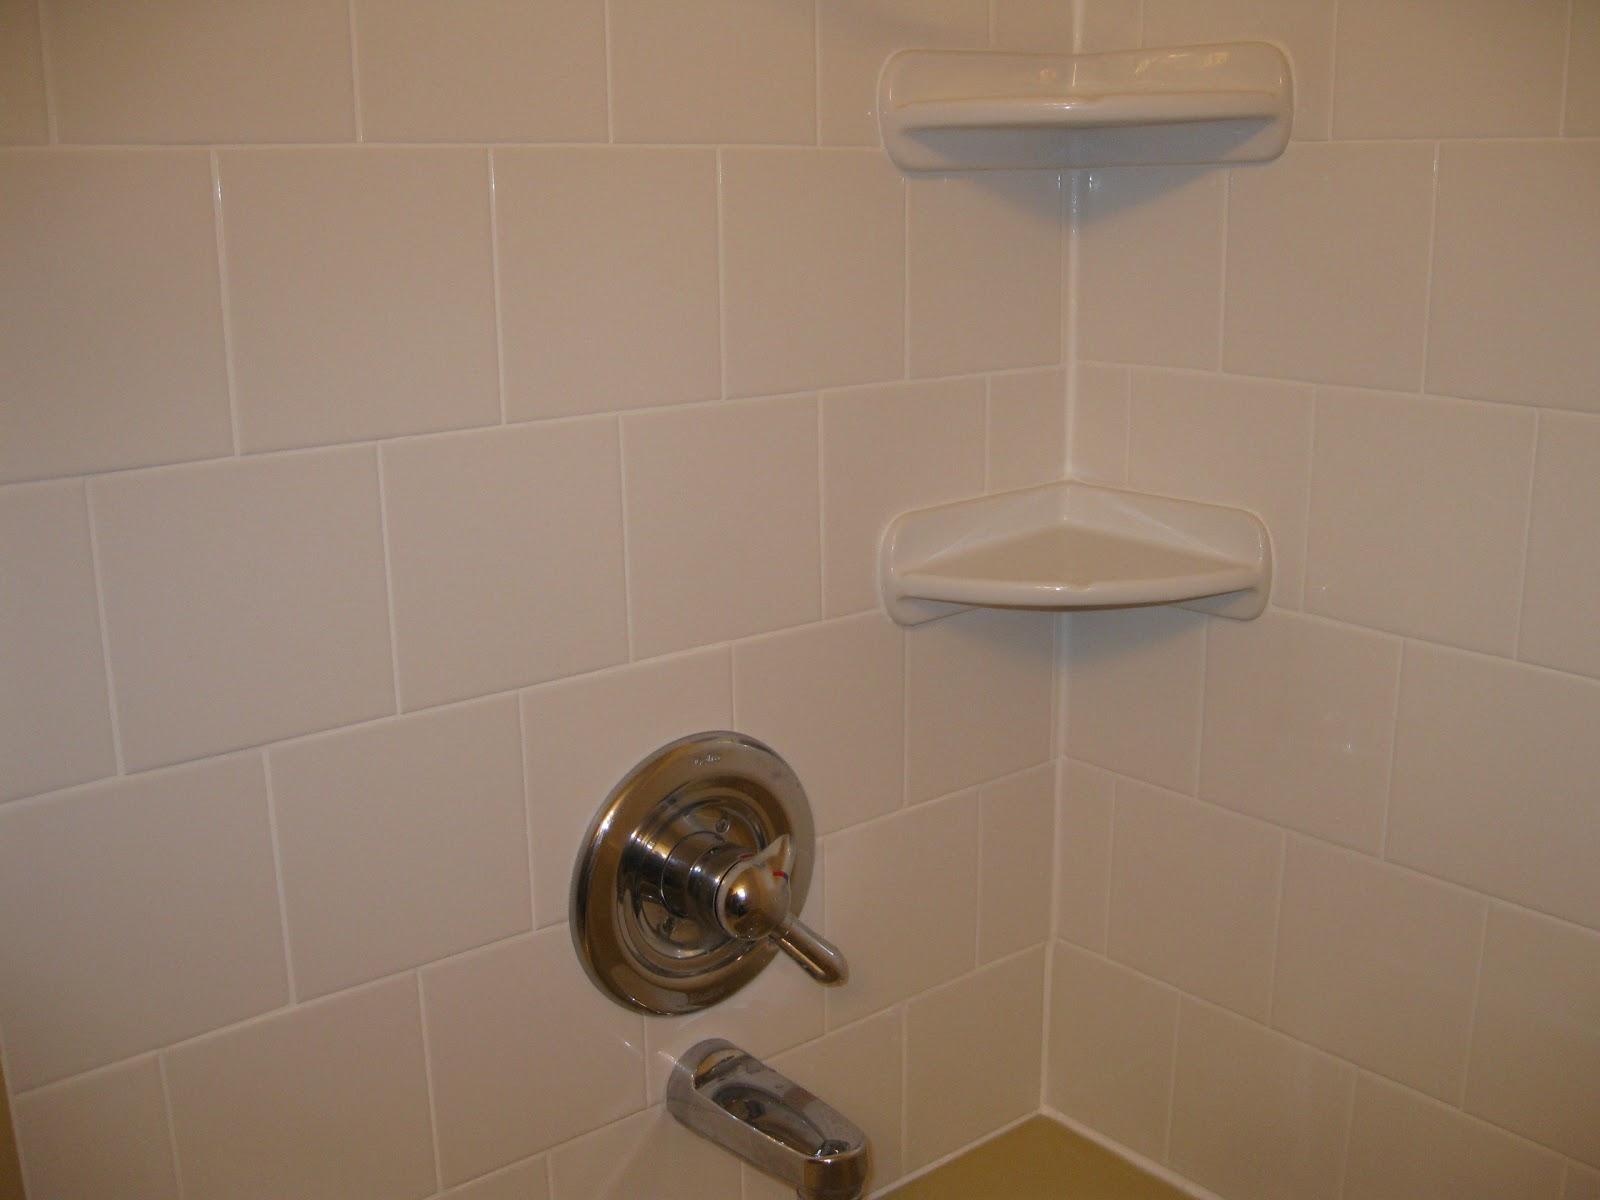 13 Wonderful Ideas For The 6x6 Ceramic Bathroom Tile 2020